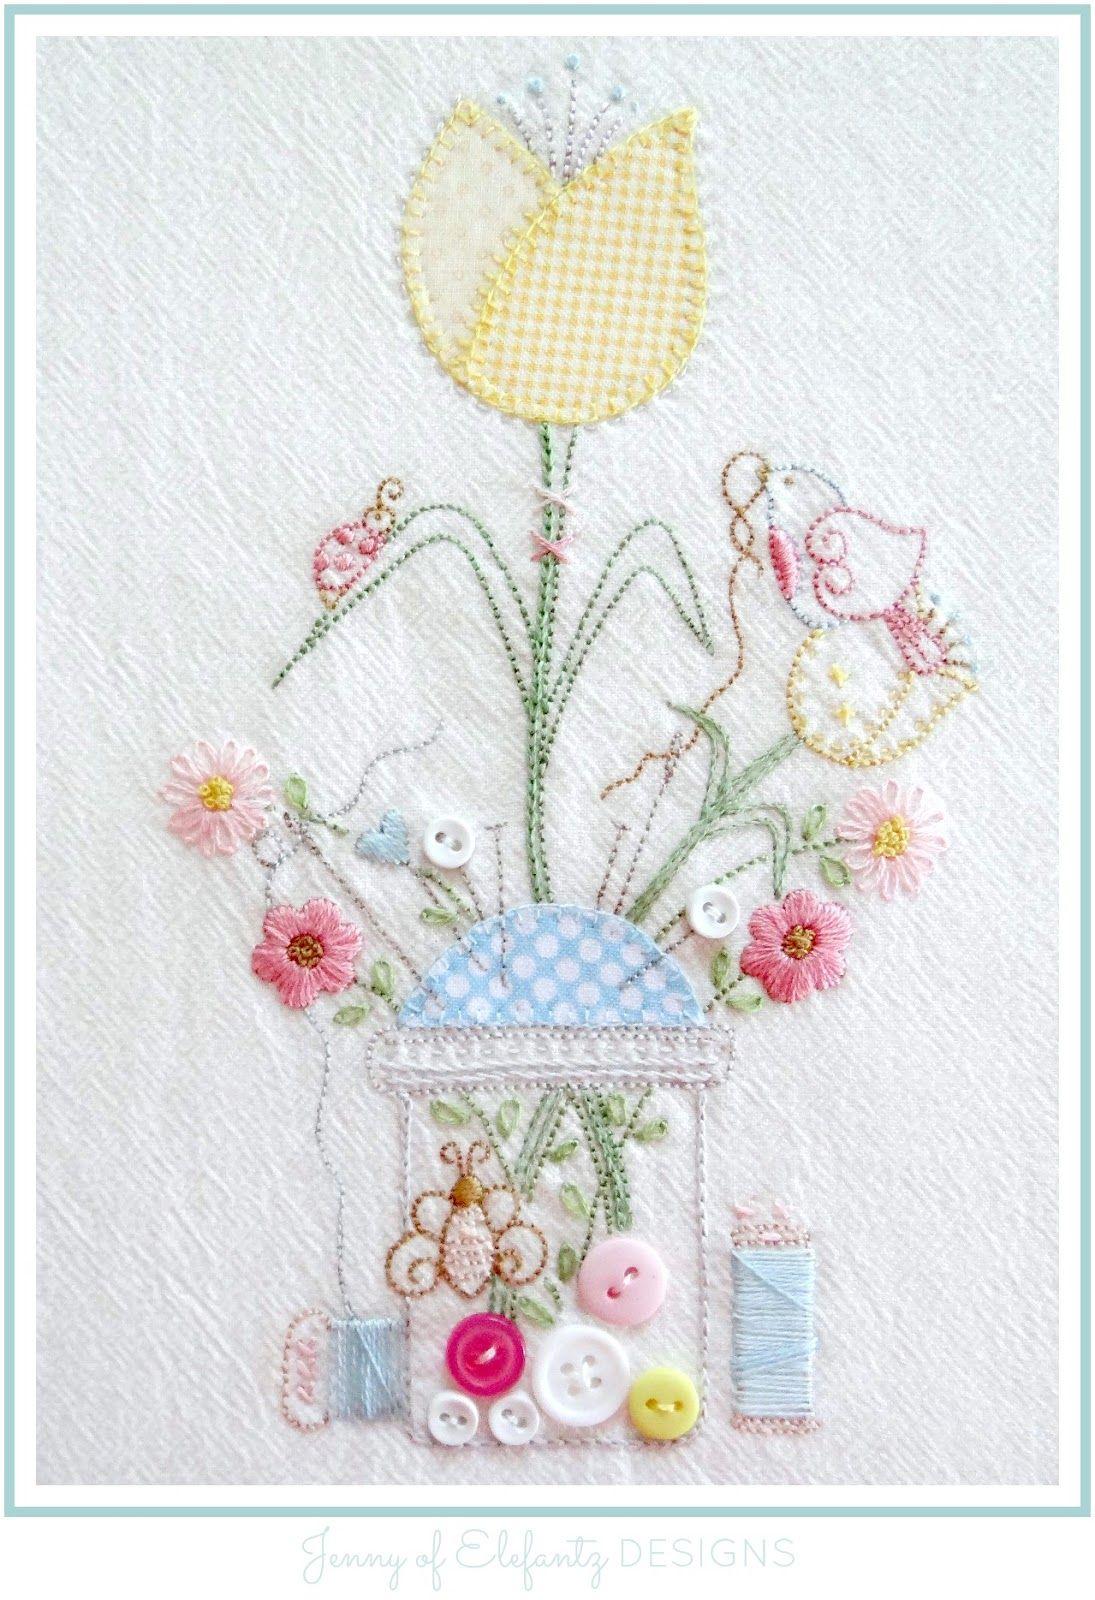 Stitchery Club January 2019 Embroidery flowers pattern